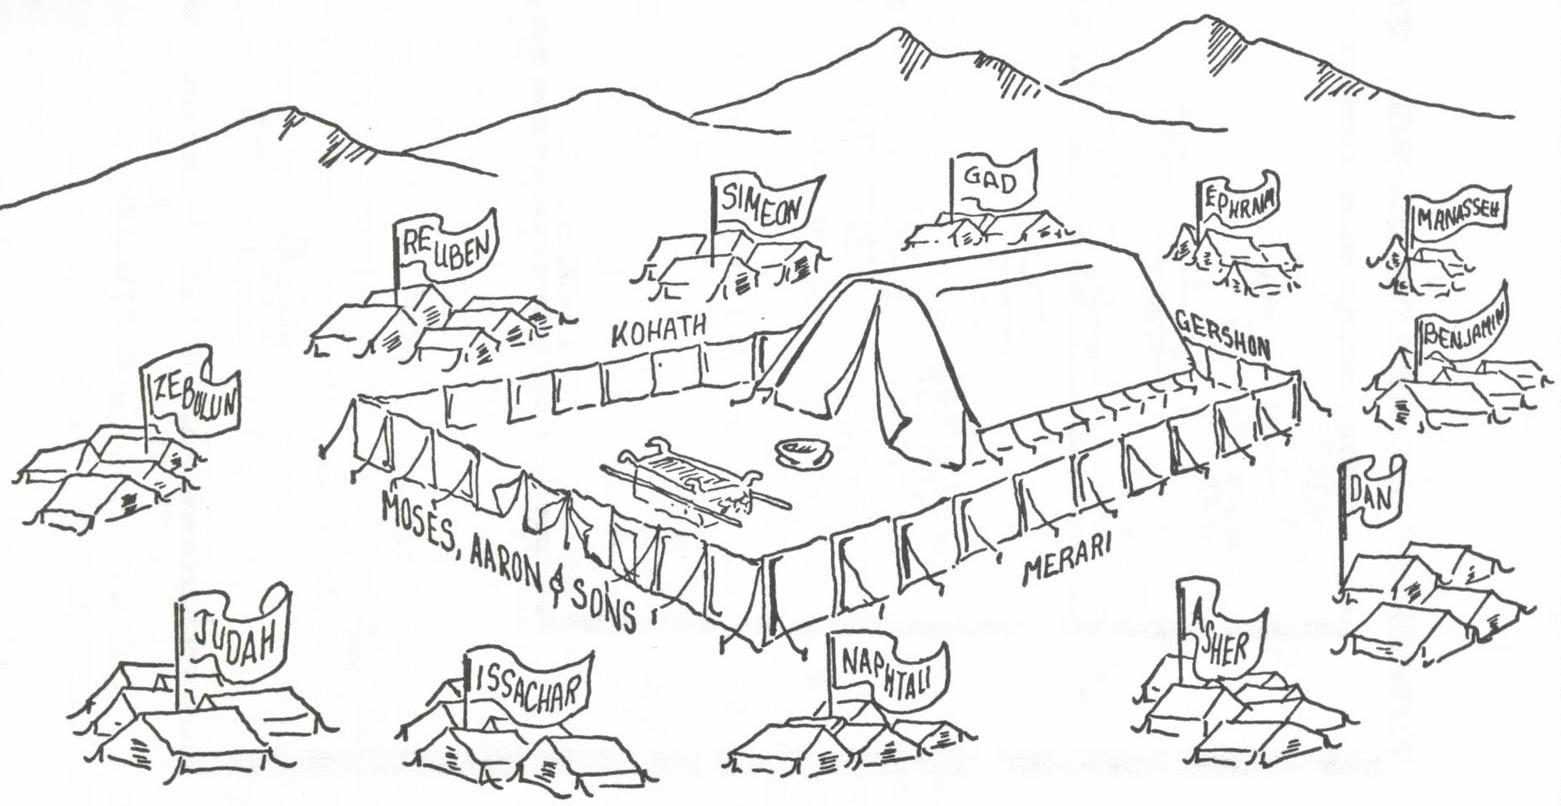 Tabernacle encampment